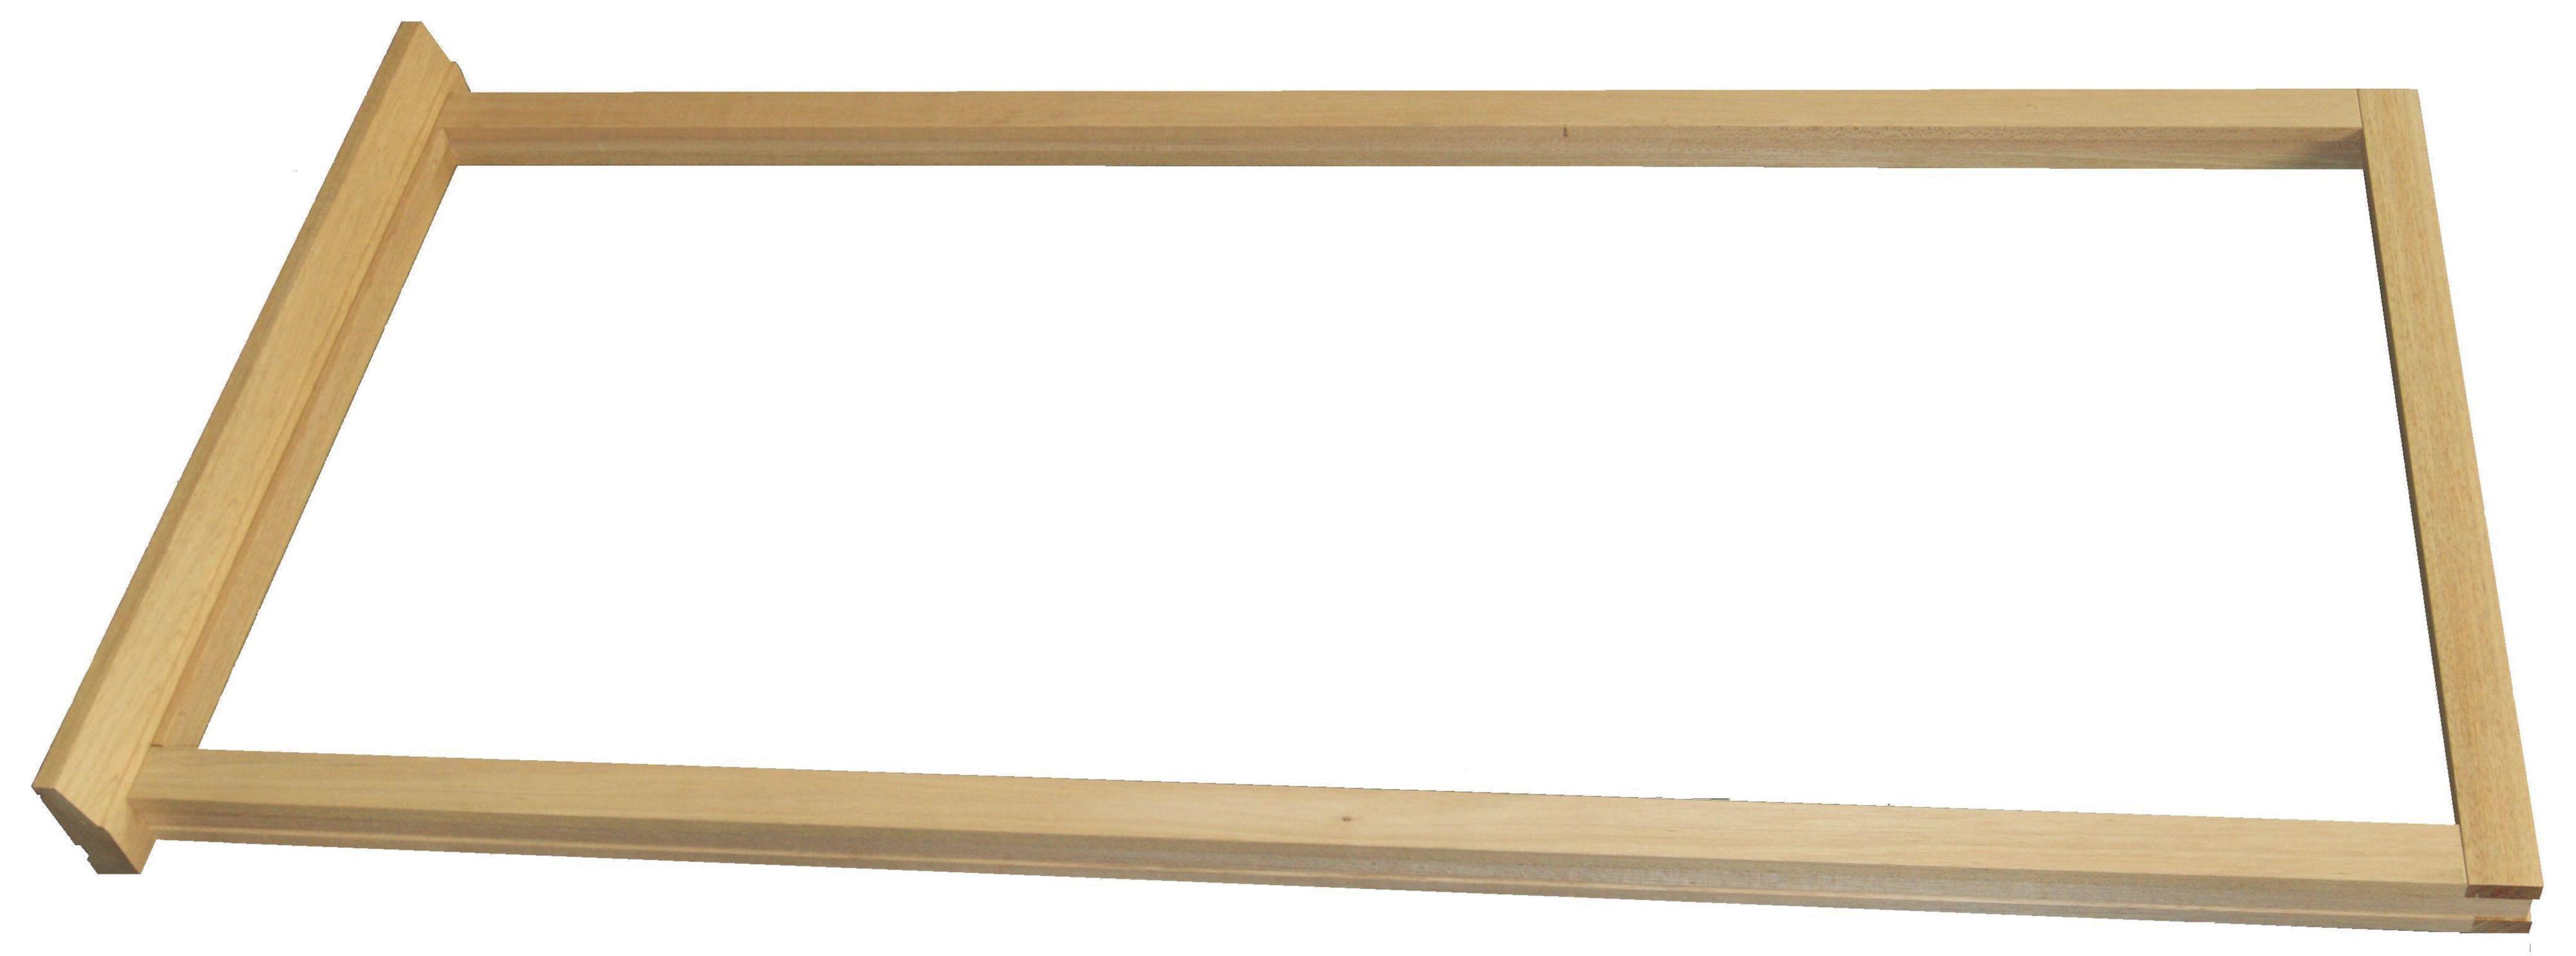 exterior door frame kits. untreated external door frame, (h)2125mm (w)907mm | departments diy at b\u0026q exterior frame kits i